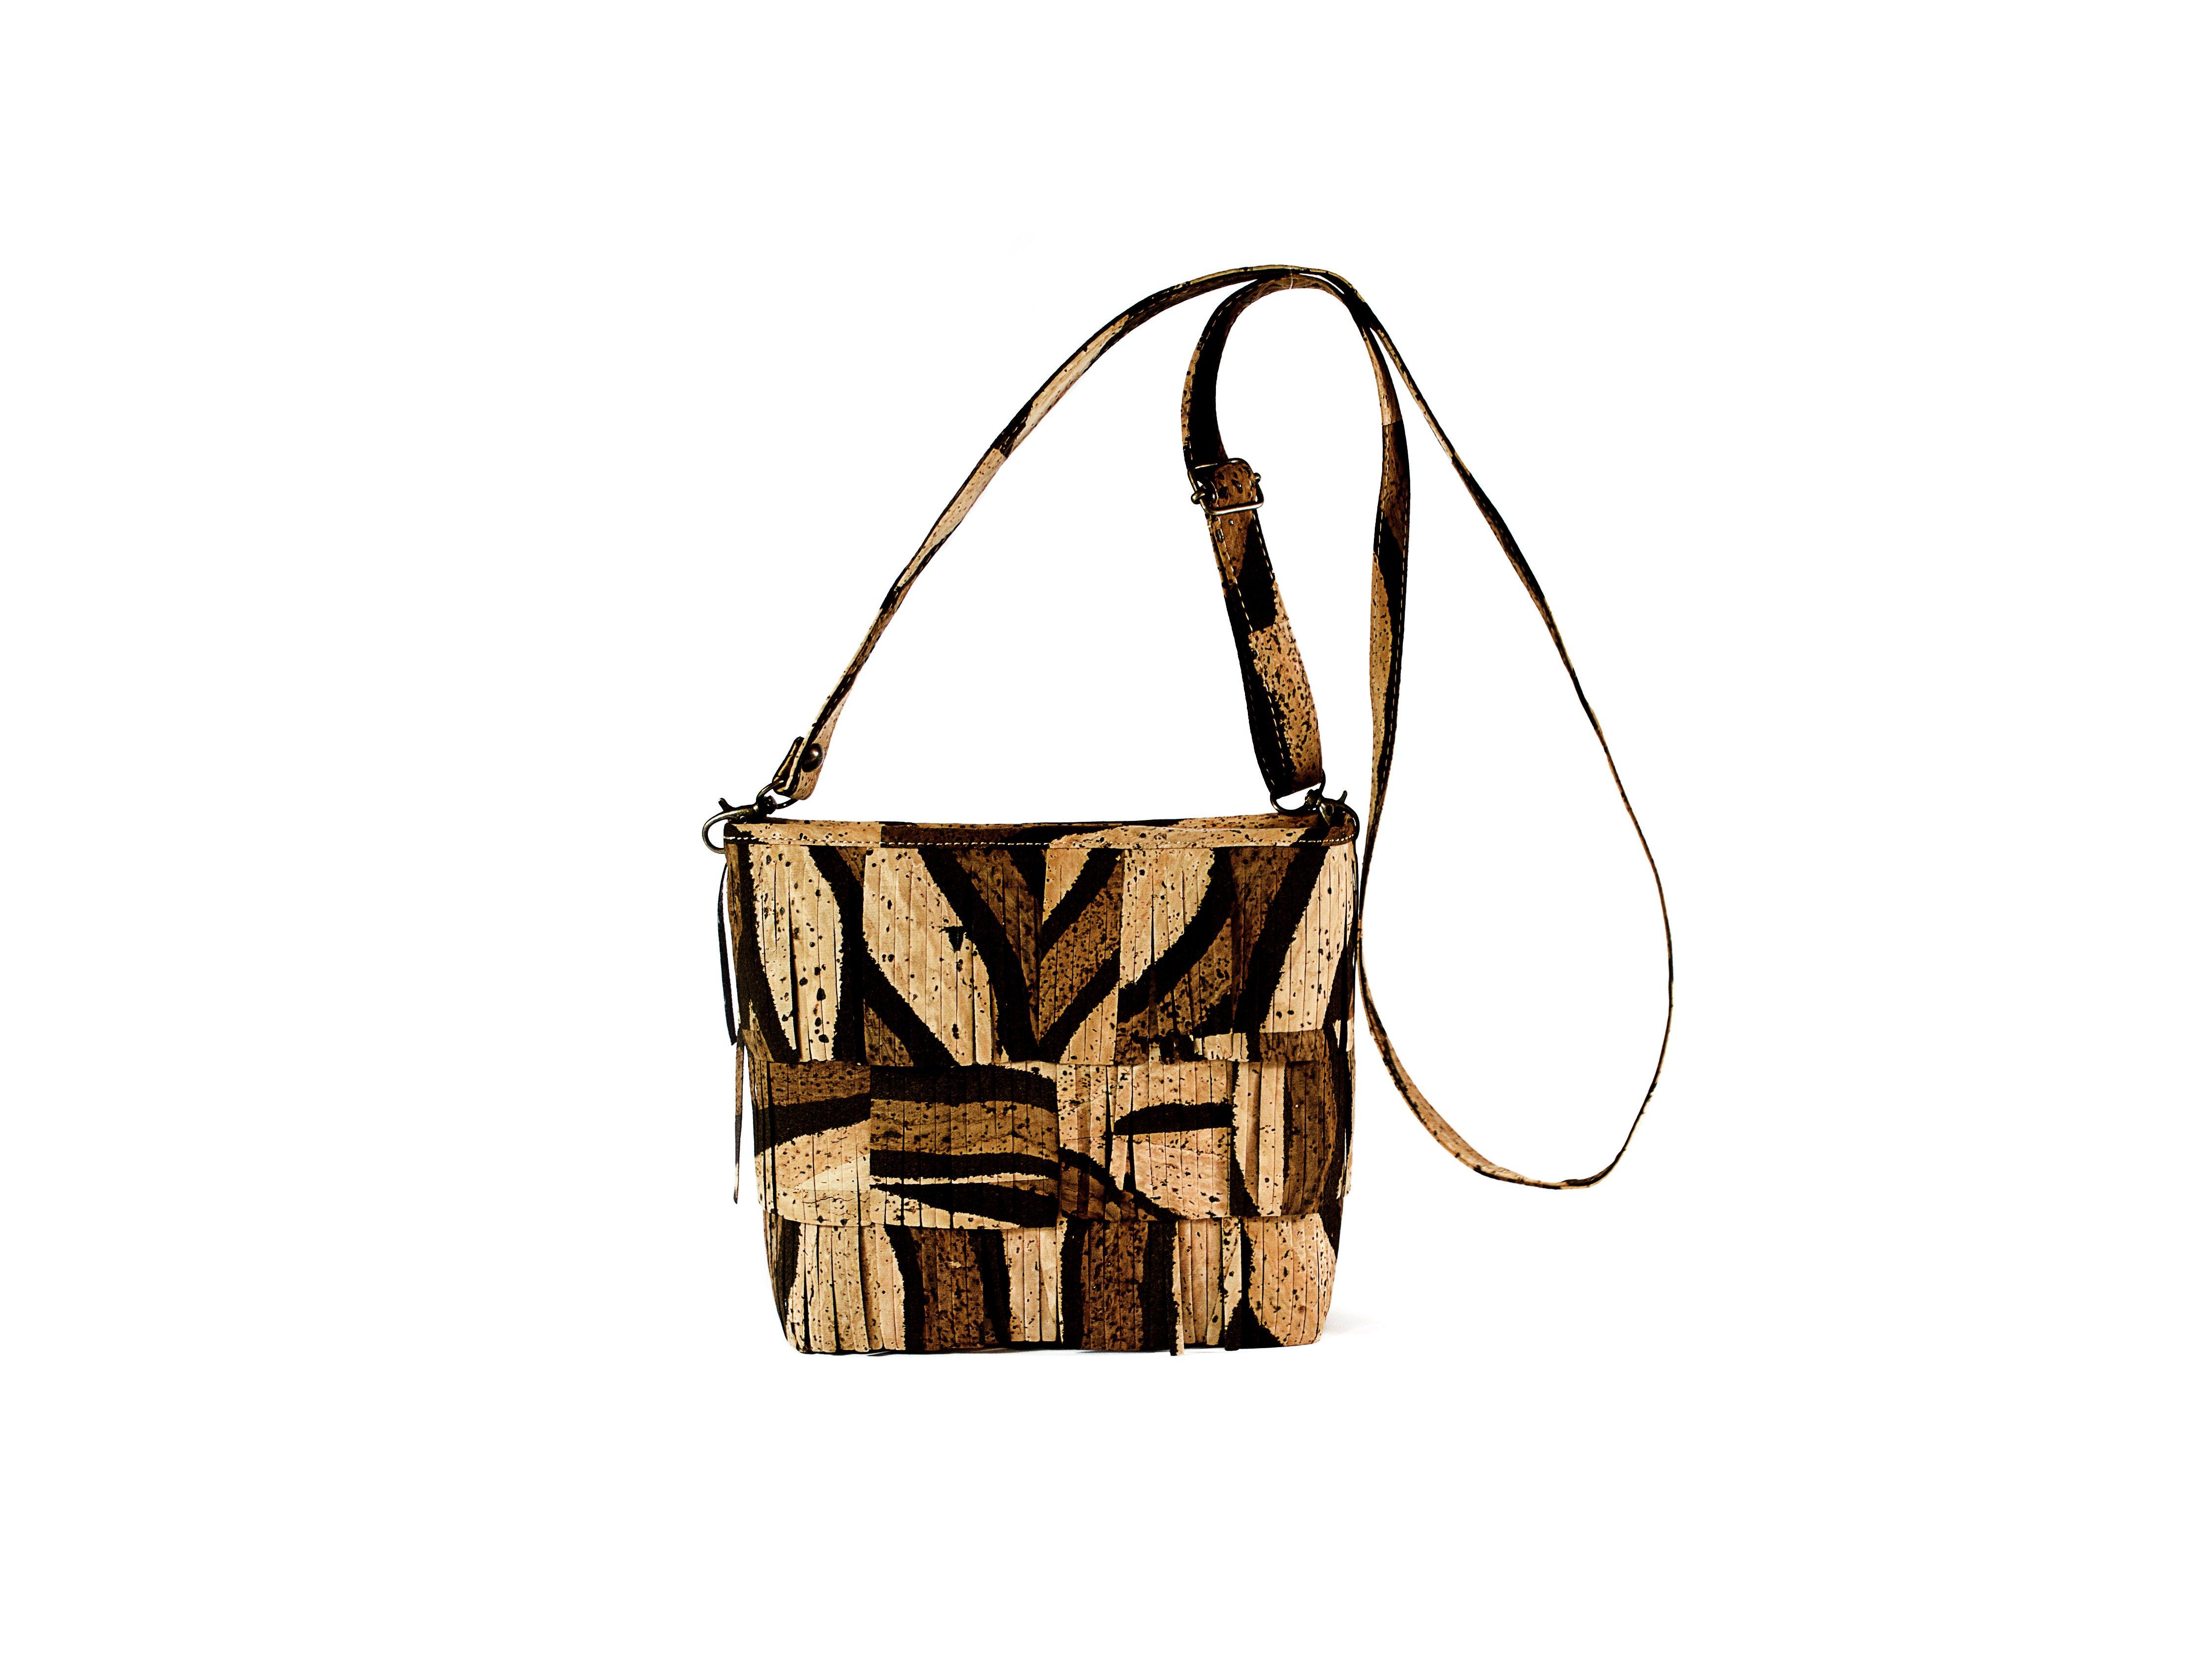 Buy cork bag 67m. Buy cork bag 67m in Spain. Buy cork bag 67m in Portugal. Buy cork bag 67m in the Canary Islands